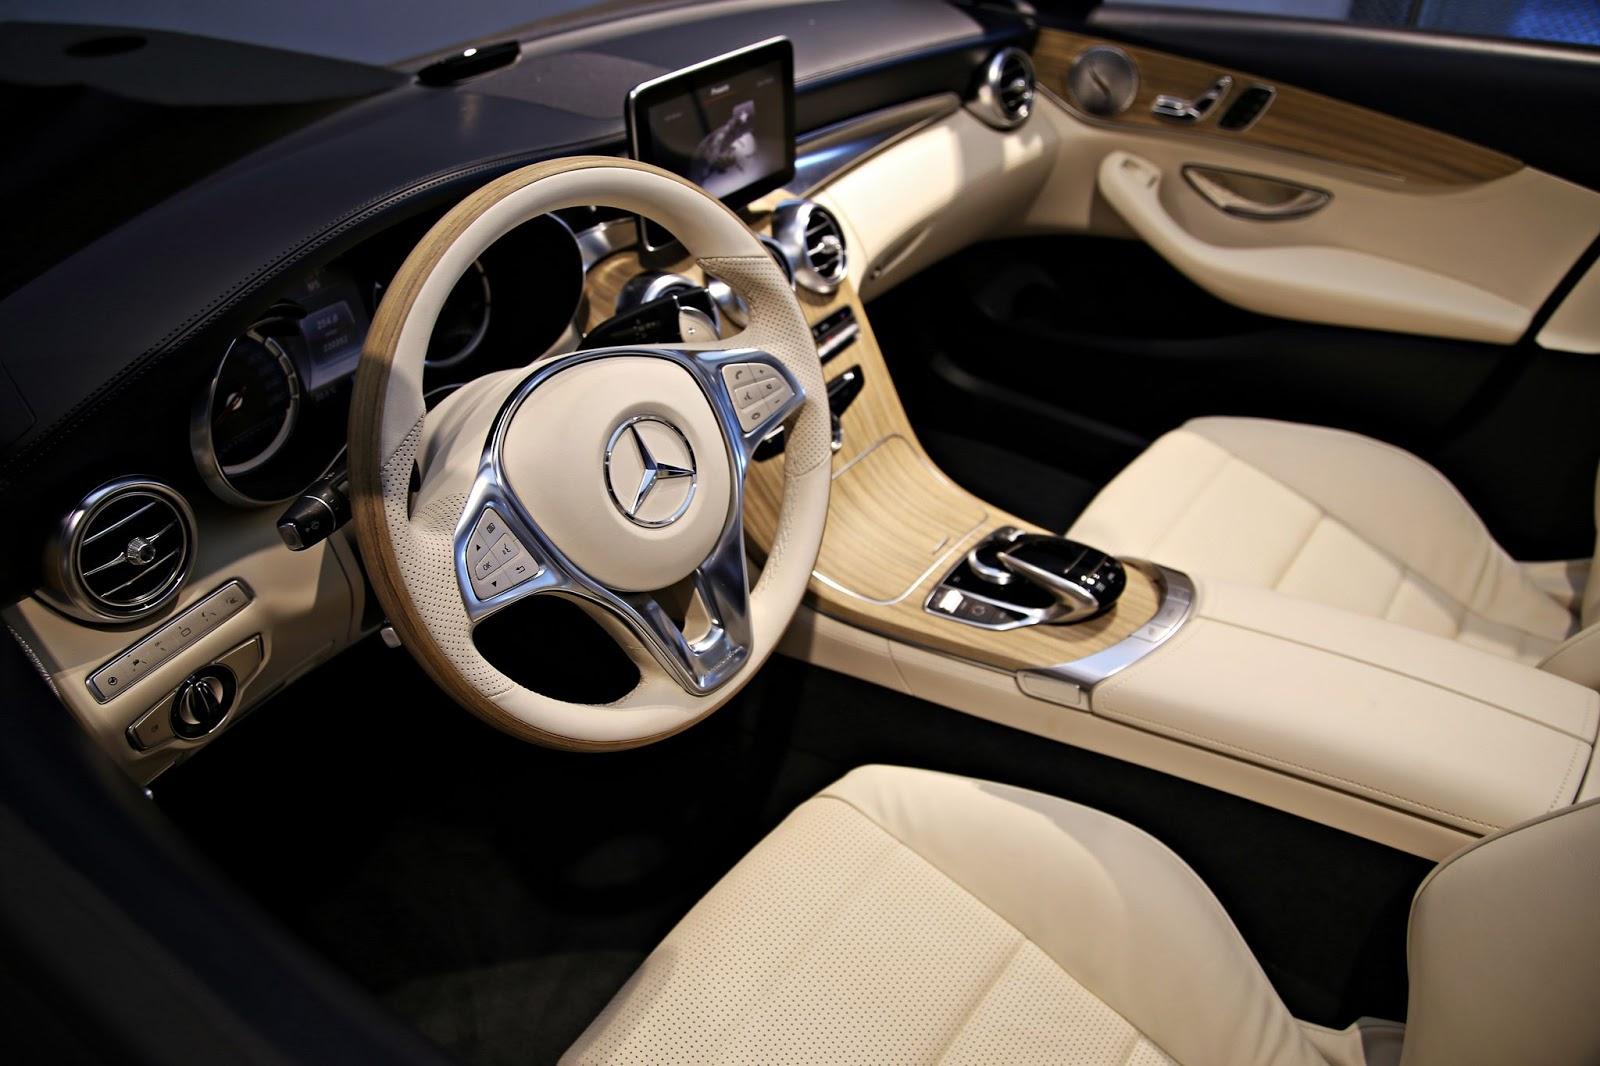 Mercedes-Benz C-klasse AMG IV (W205) 2014 - now Cabriolet #6